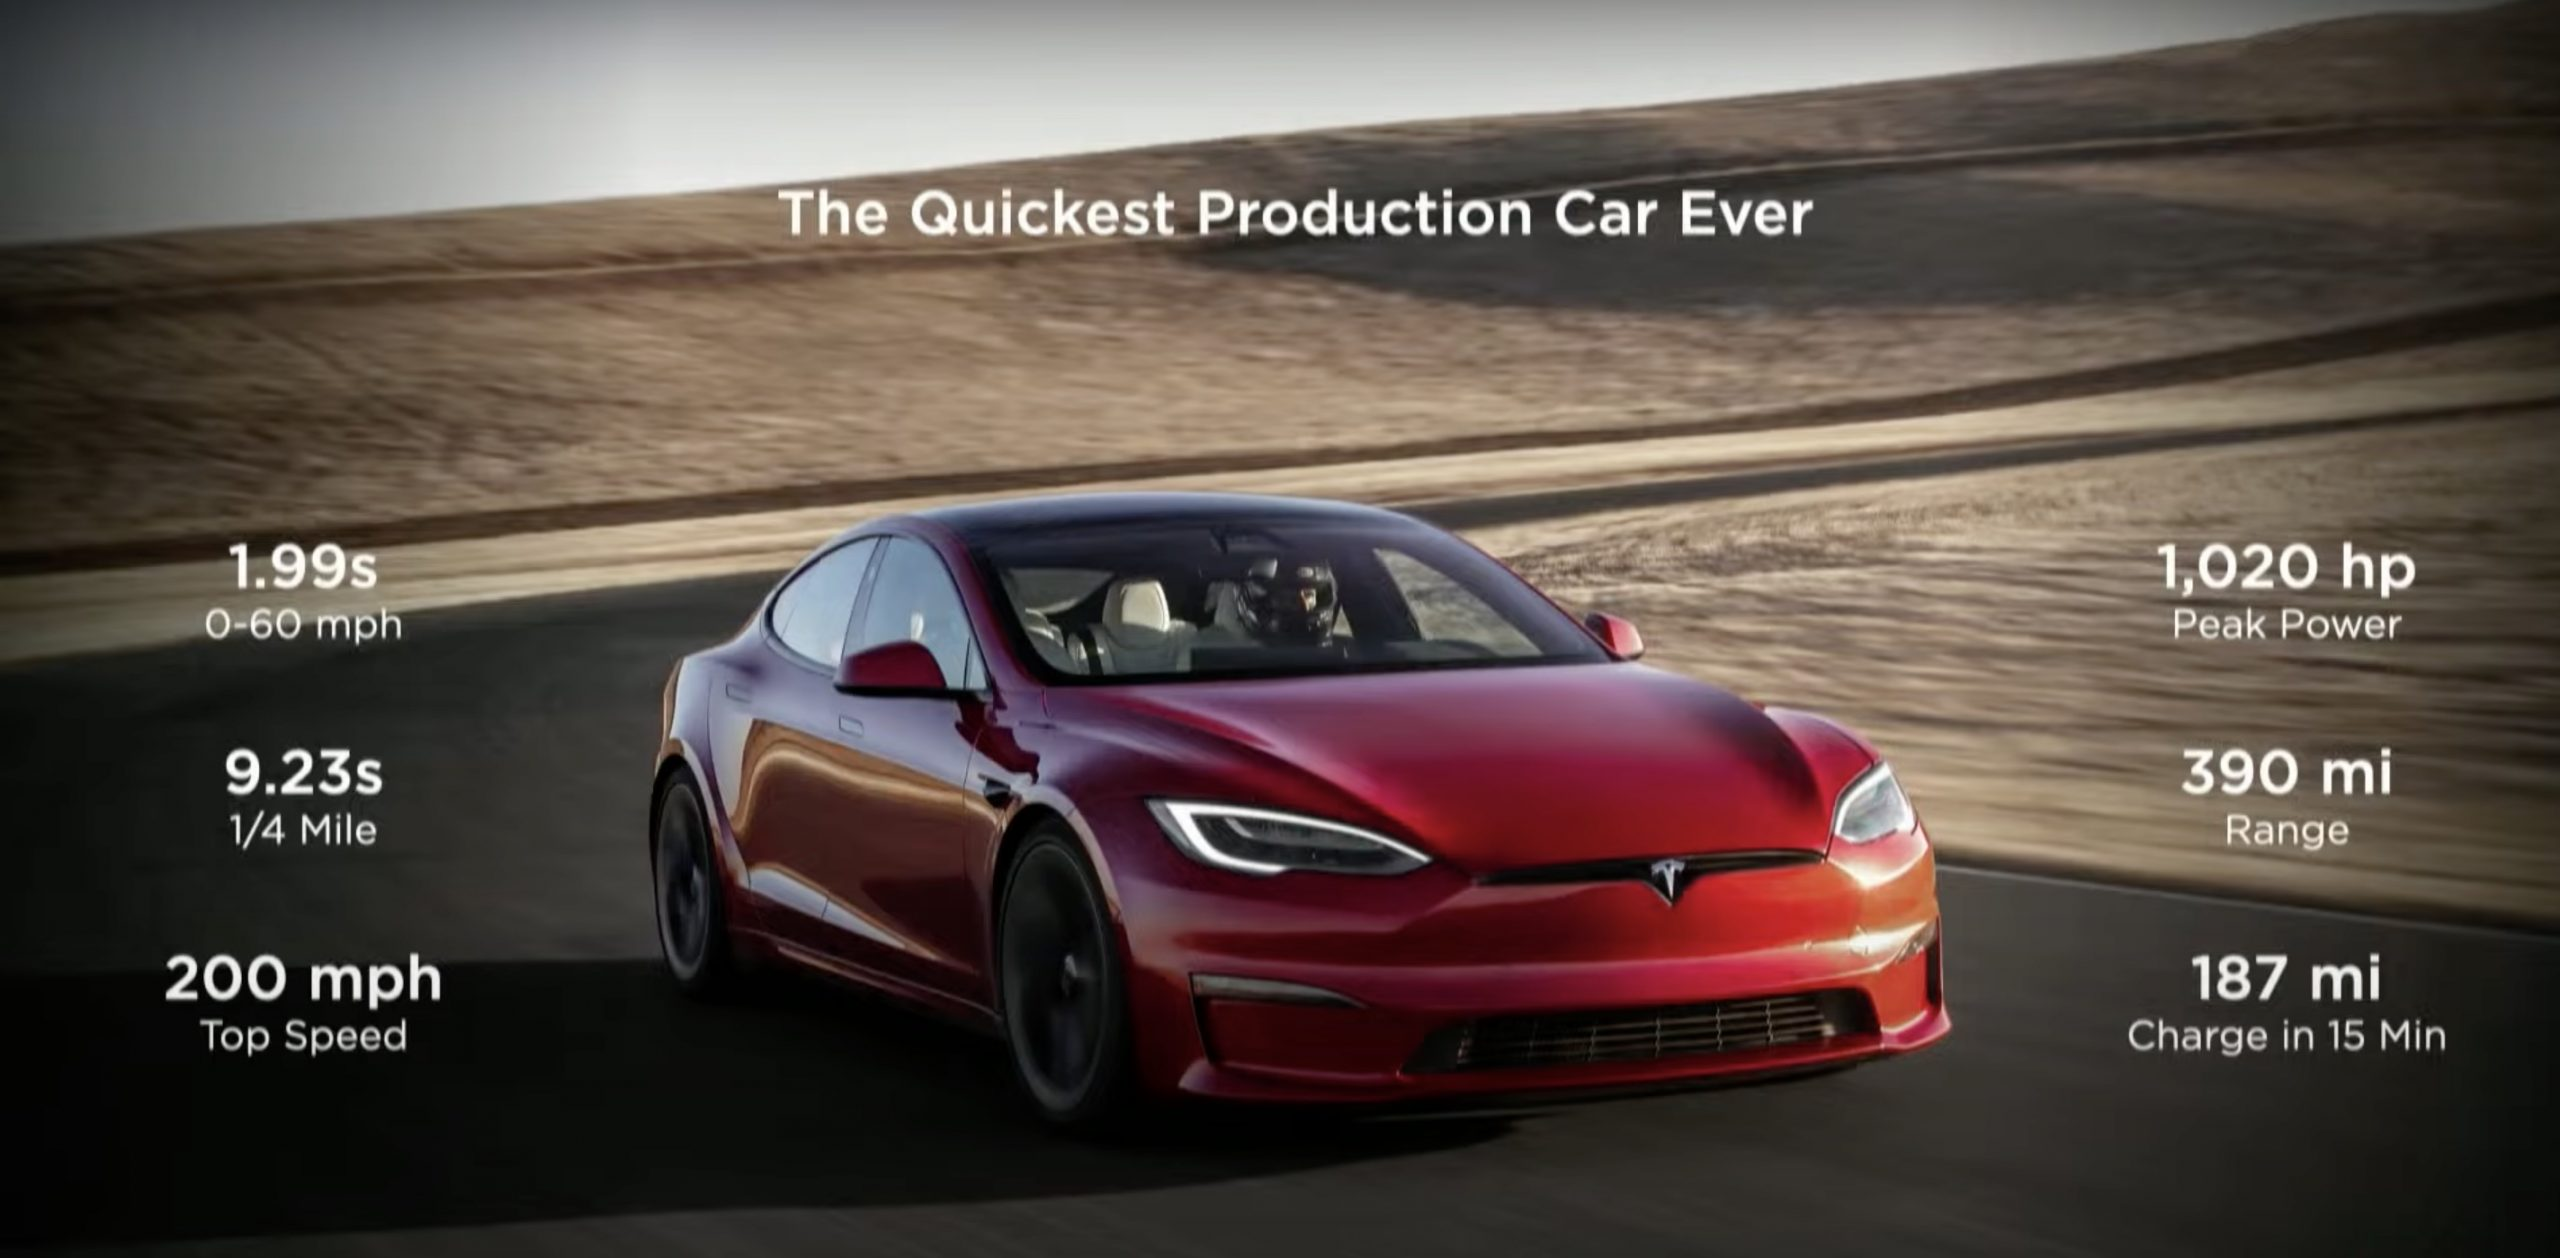 tesla-model-s-plaid-quickest-car-ever